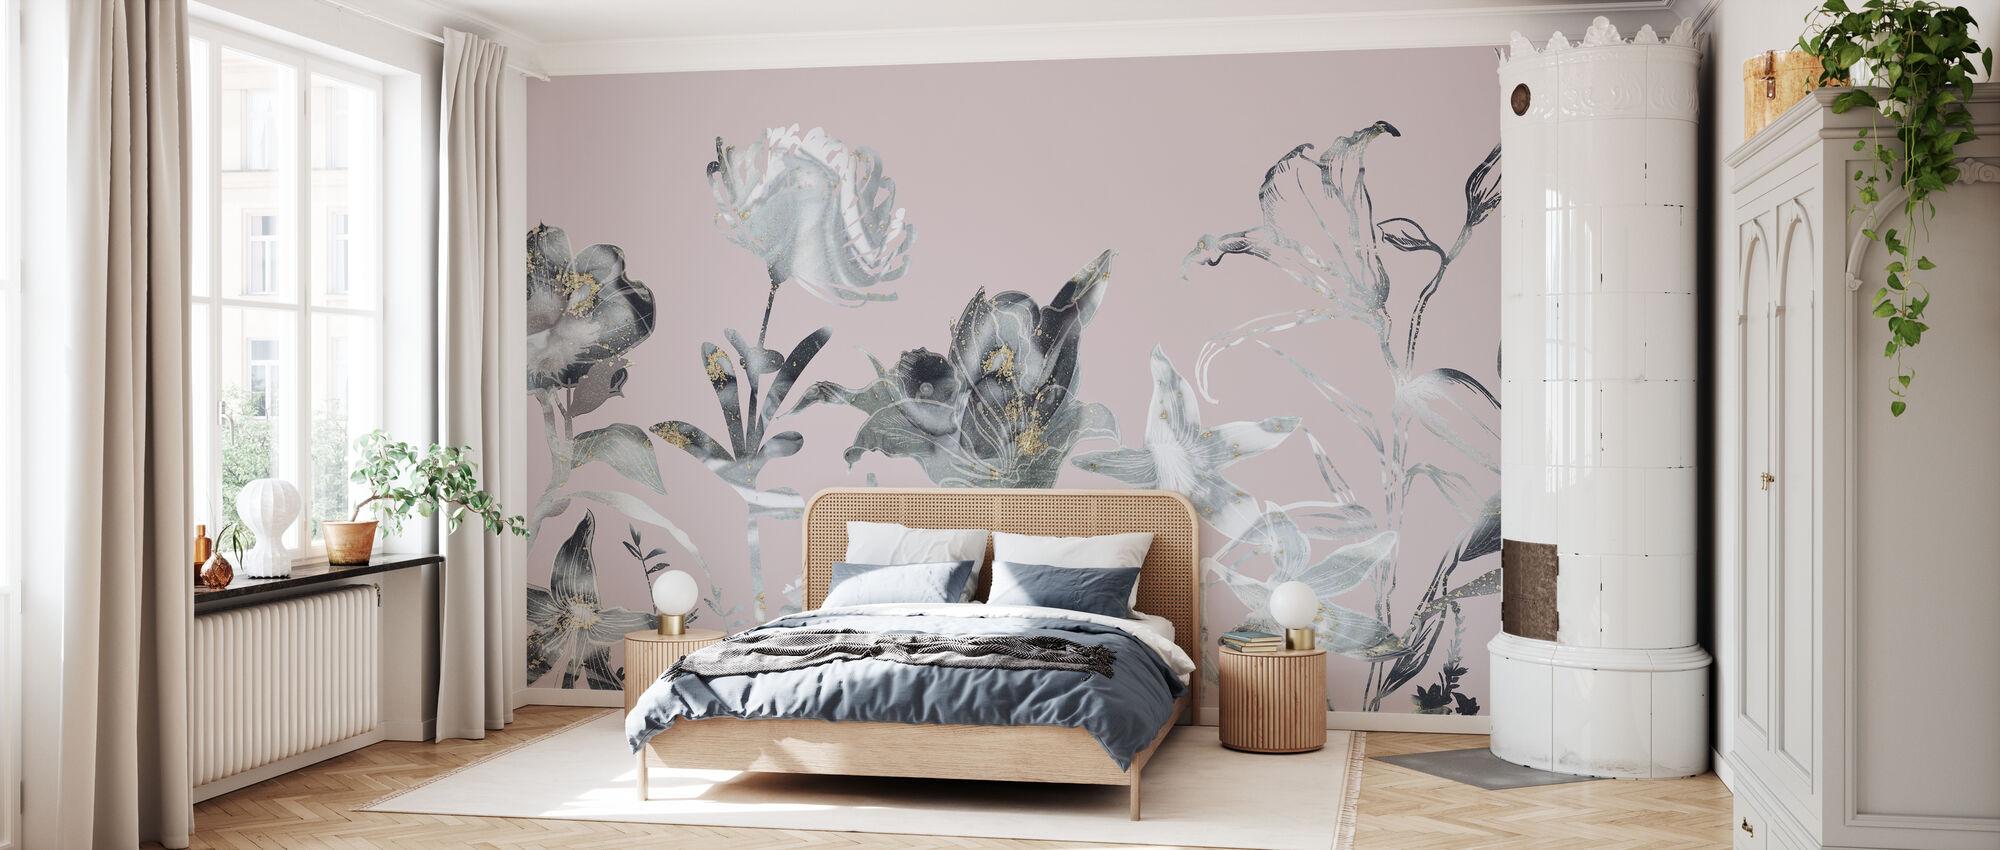 Floral Sway - Blush - Wallpaper - Bedroom